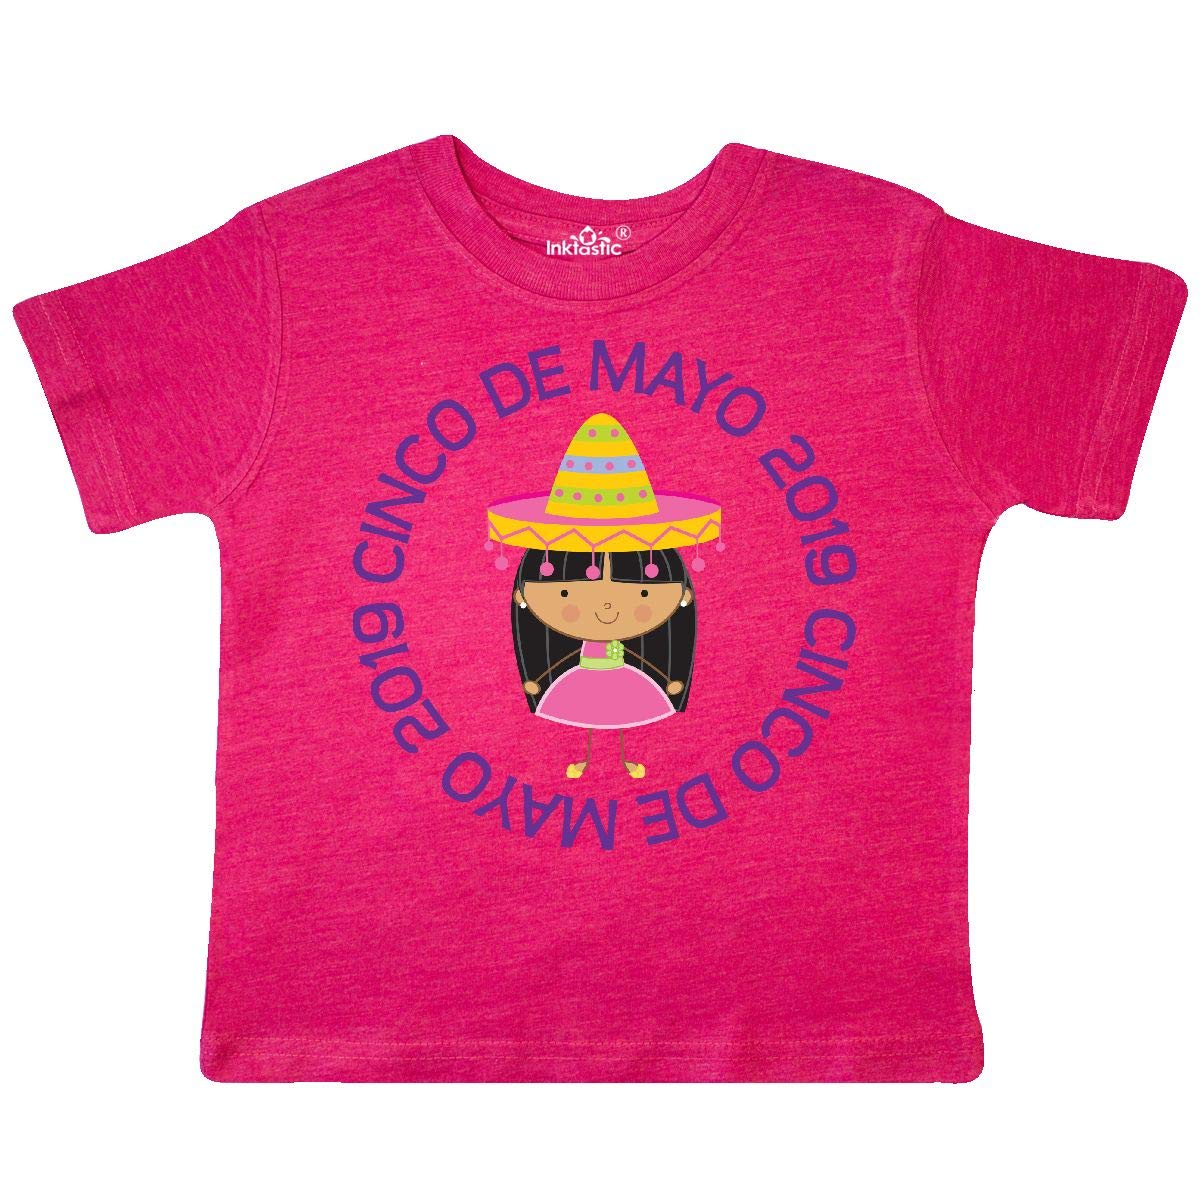 inktastic Cinco De Mayo 2019 Girls Fiesta Toddler T-Shirt